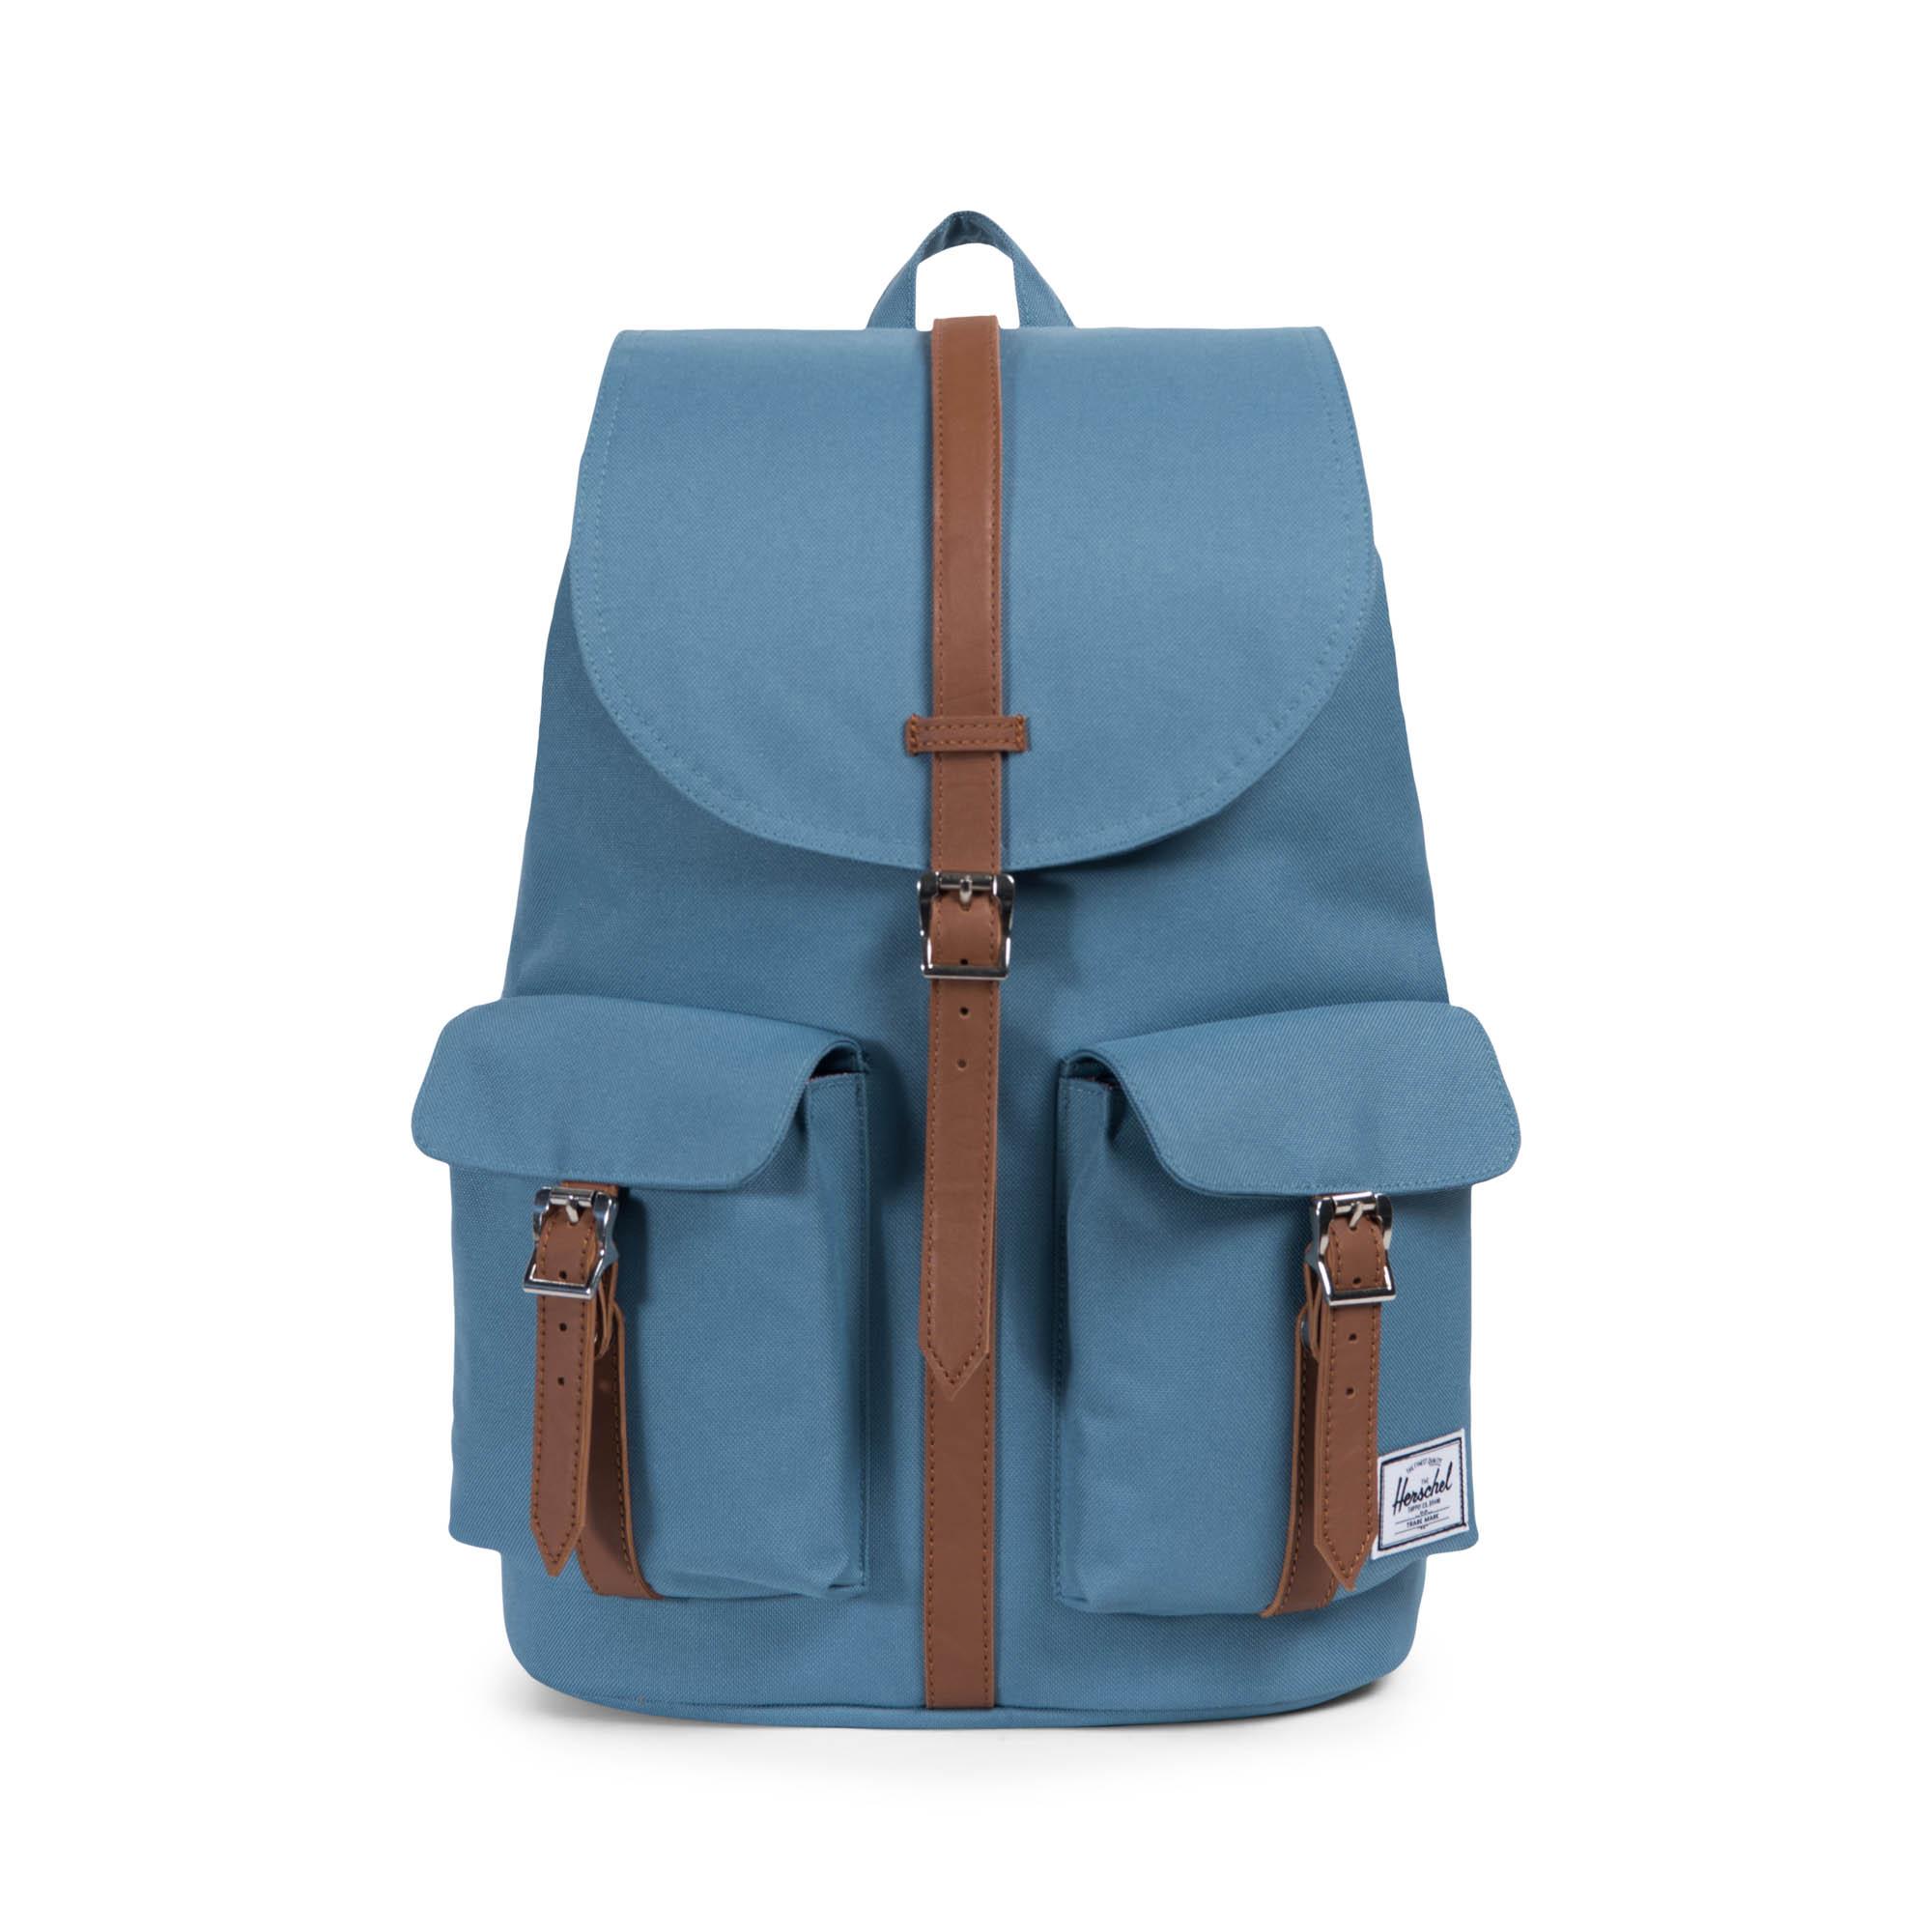 90d97eca4999 Details about Herschel Dawson 20.5 Litre Back Pack Aegean Blue Tan  Synthetic Leather